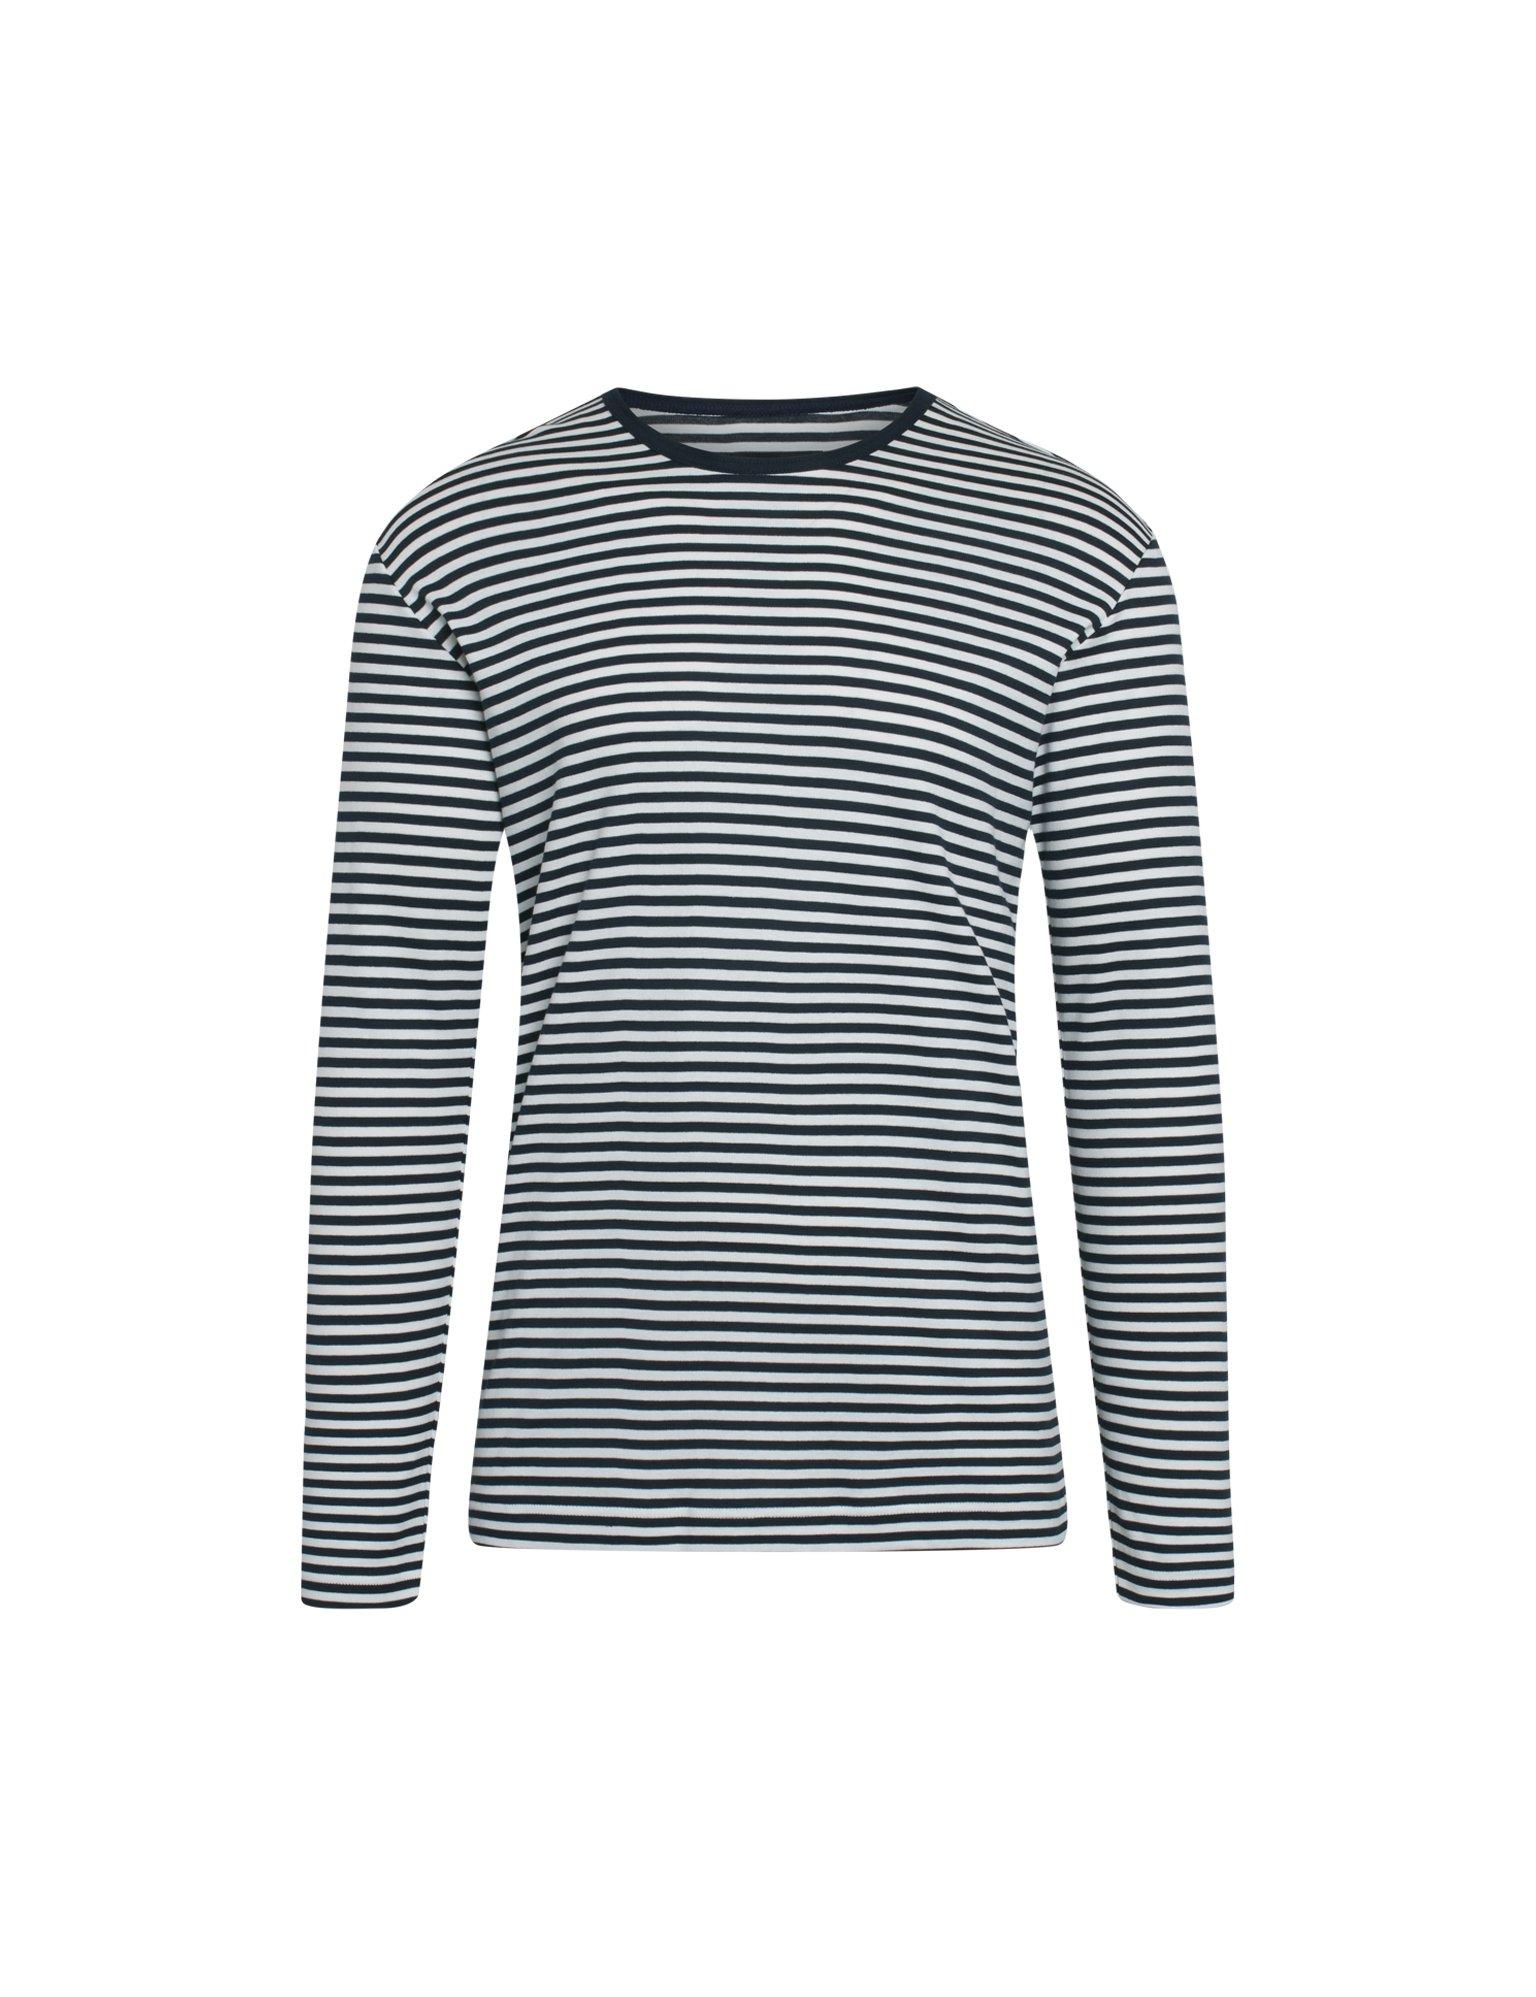 Mads Nørgaard Duo Rib Tobias langærmet t-shirt